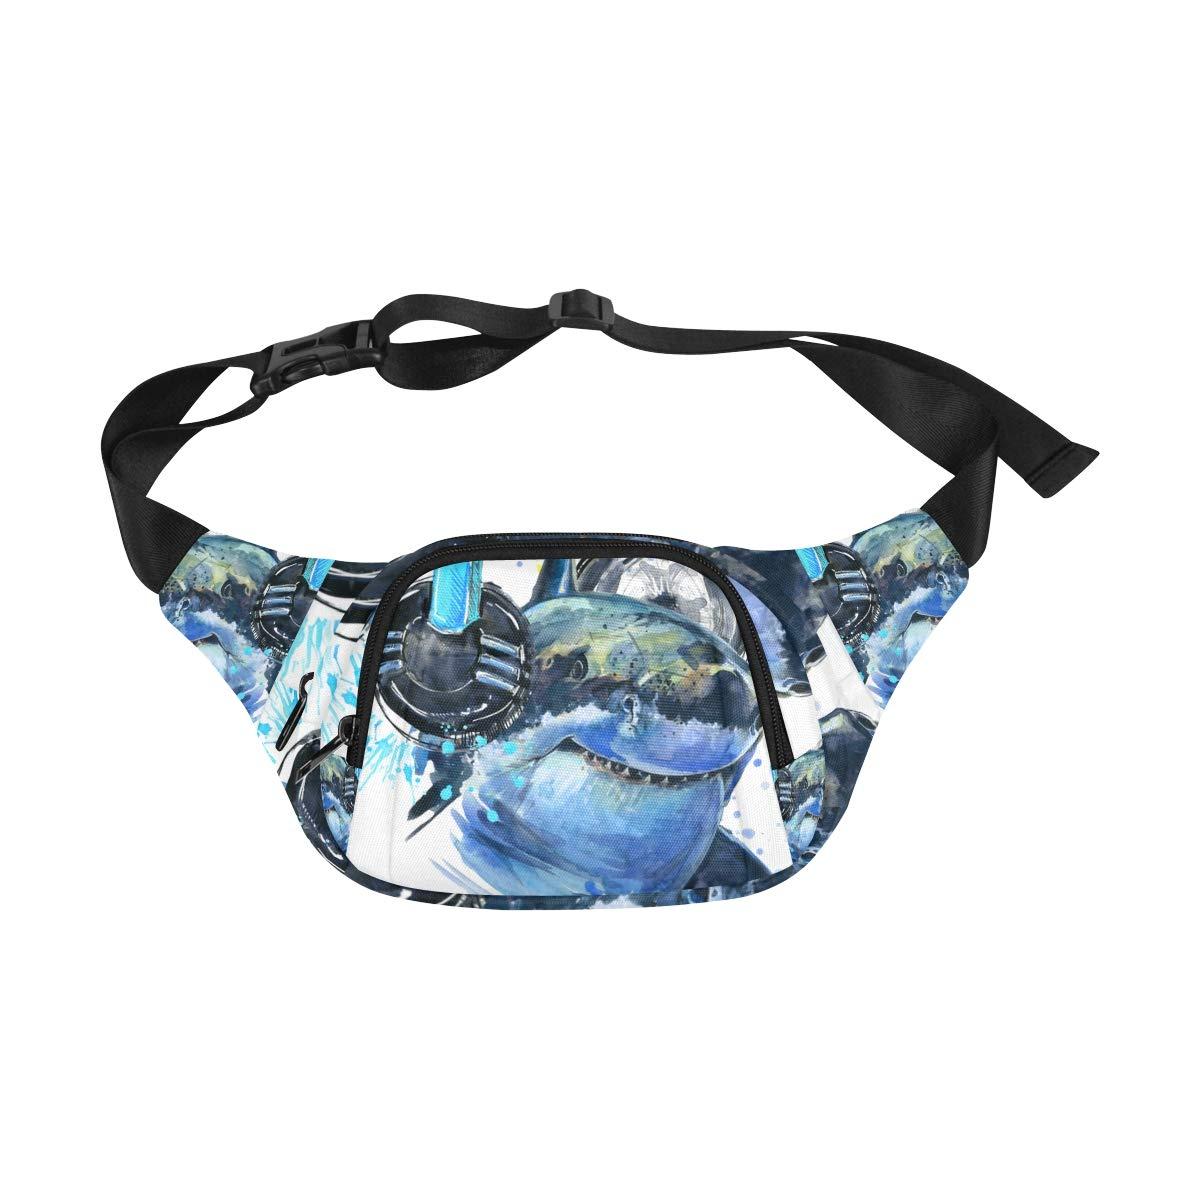 Cute Shark Listening To Music Fenny Packs Waist Bags Adjustable Belt Waterproof Nylon Travel Running Sport Vacation Party For Men Women Boys Girls Kids